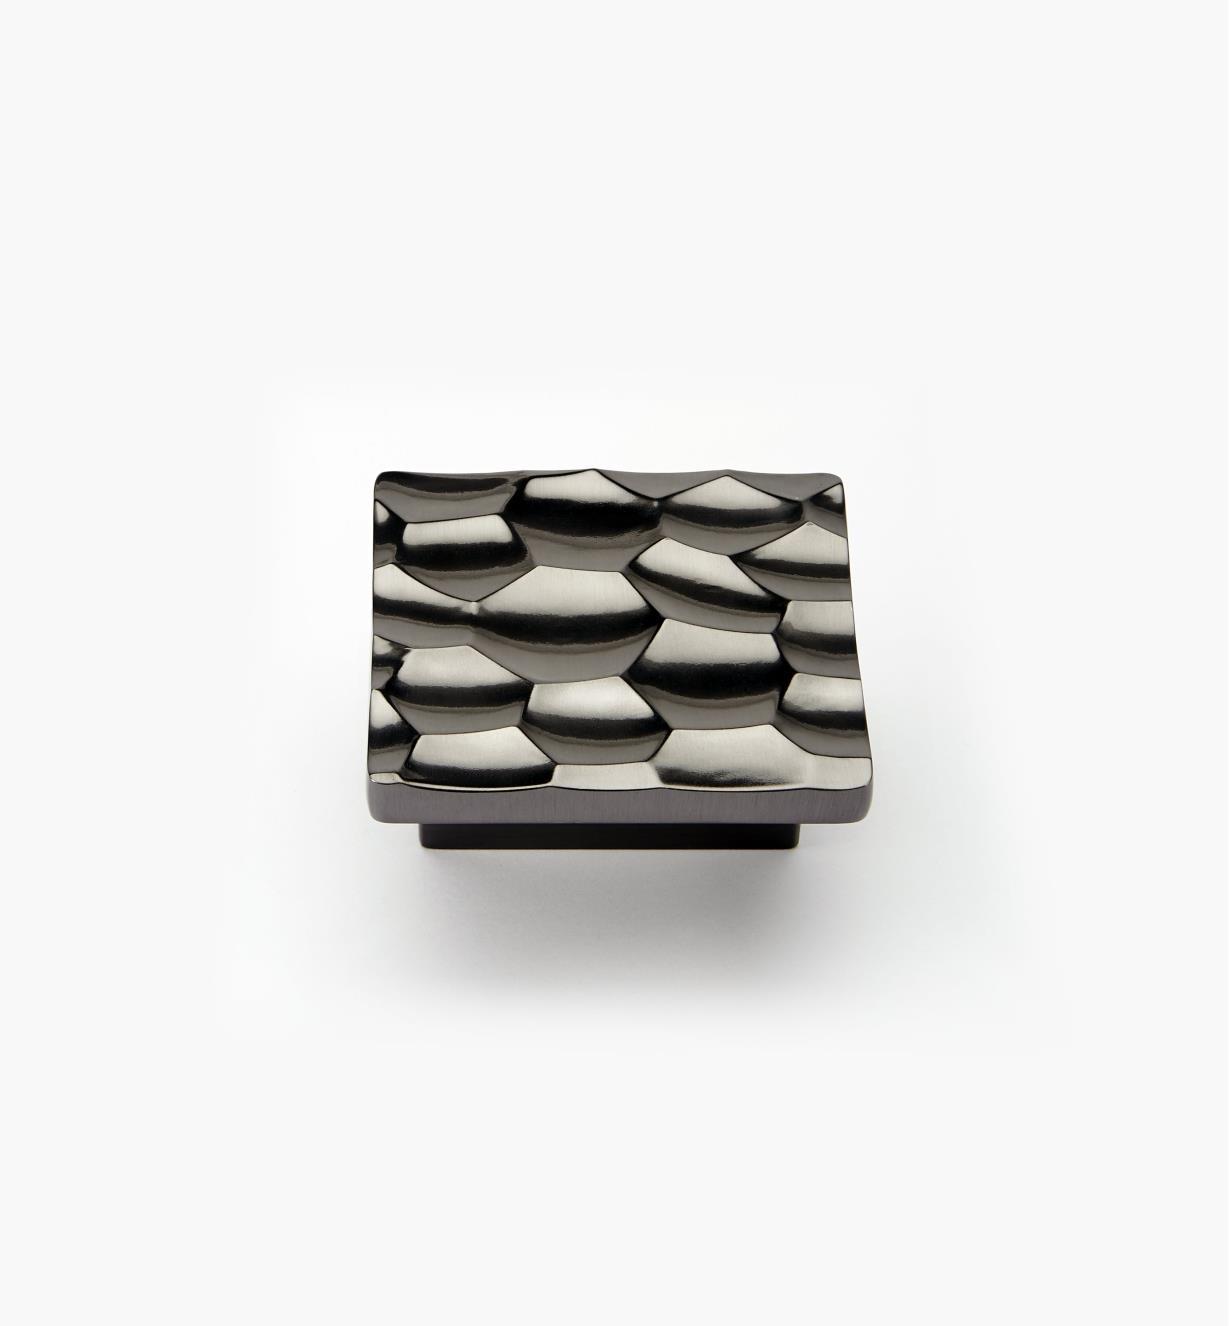 01G1521 - Bouton Sonora, fini nickel noir, 32 mm